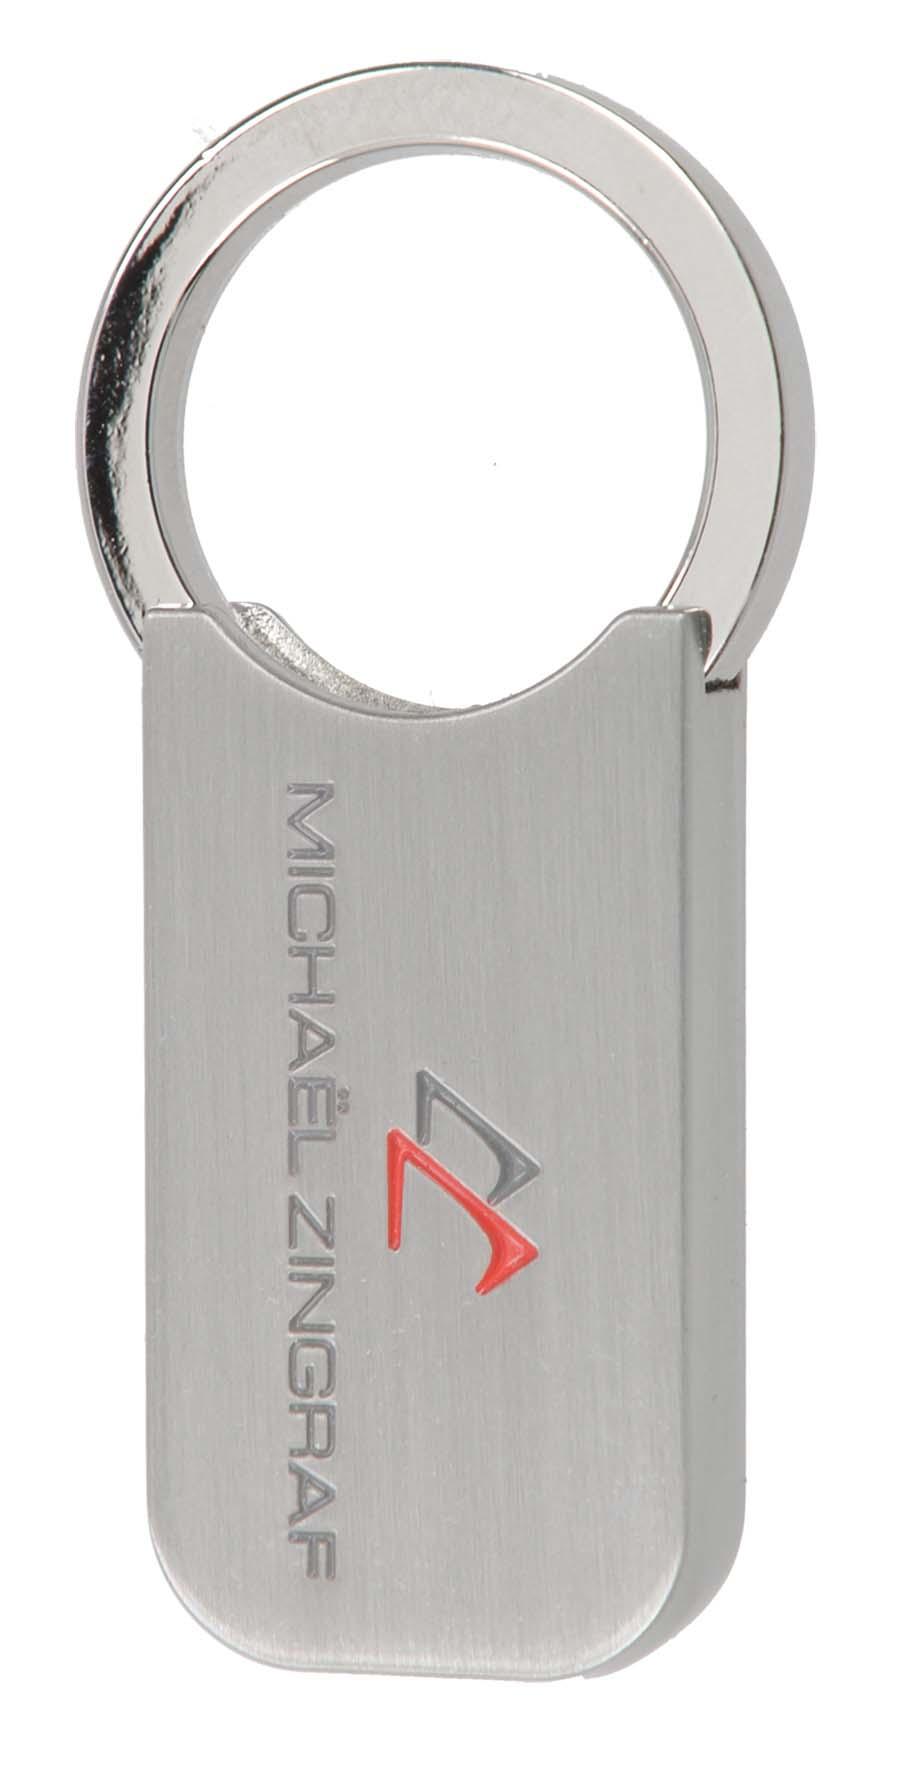 Porte-clés en Zamac